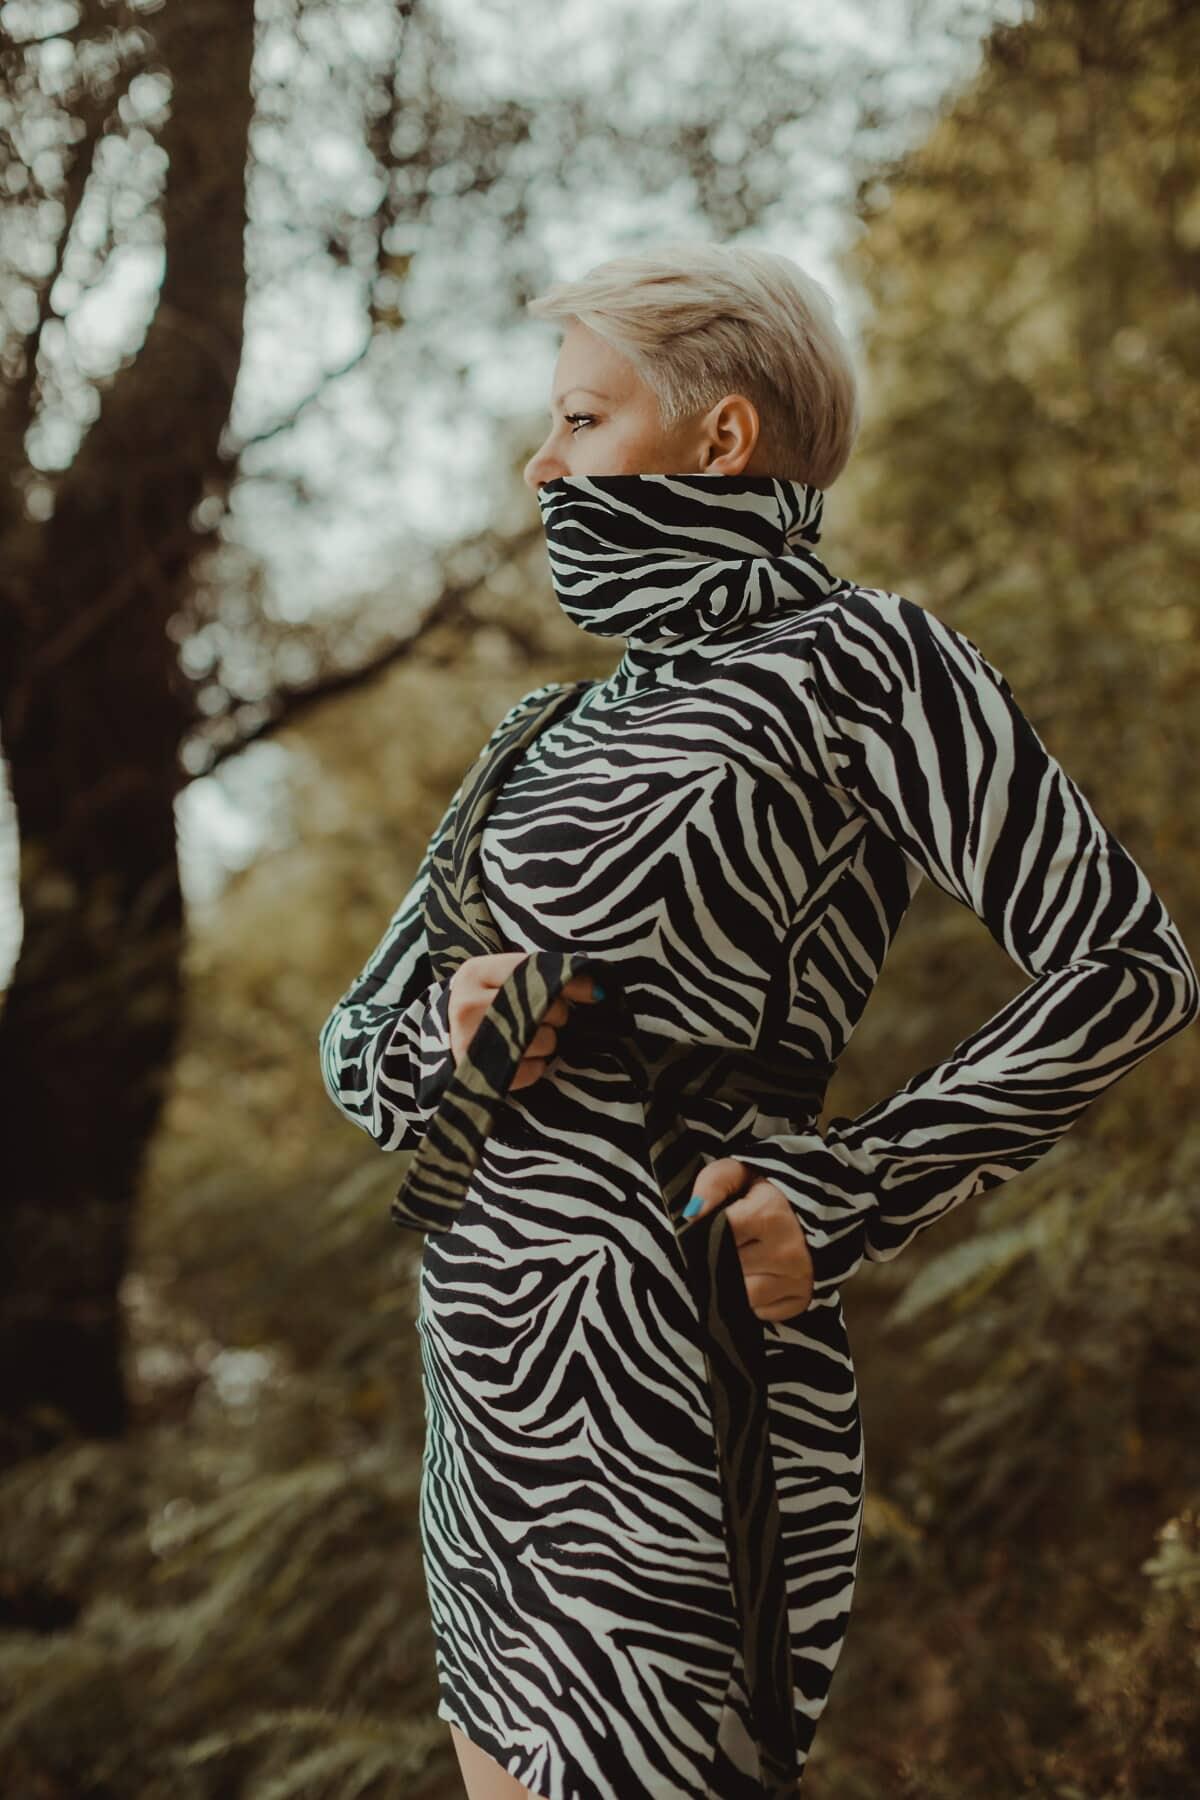 jupe, conception, camouflage, masque visage, tête, Outfit, ceinture, charme, mode, nature